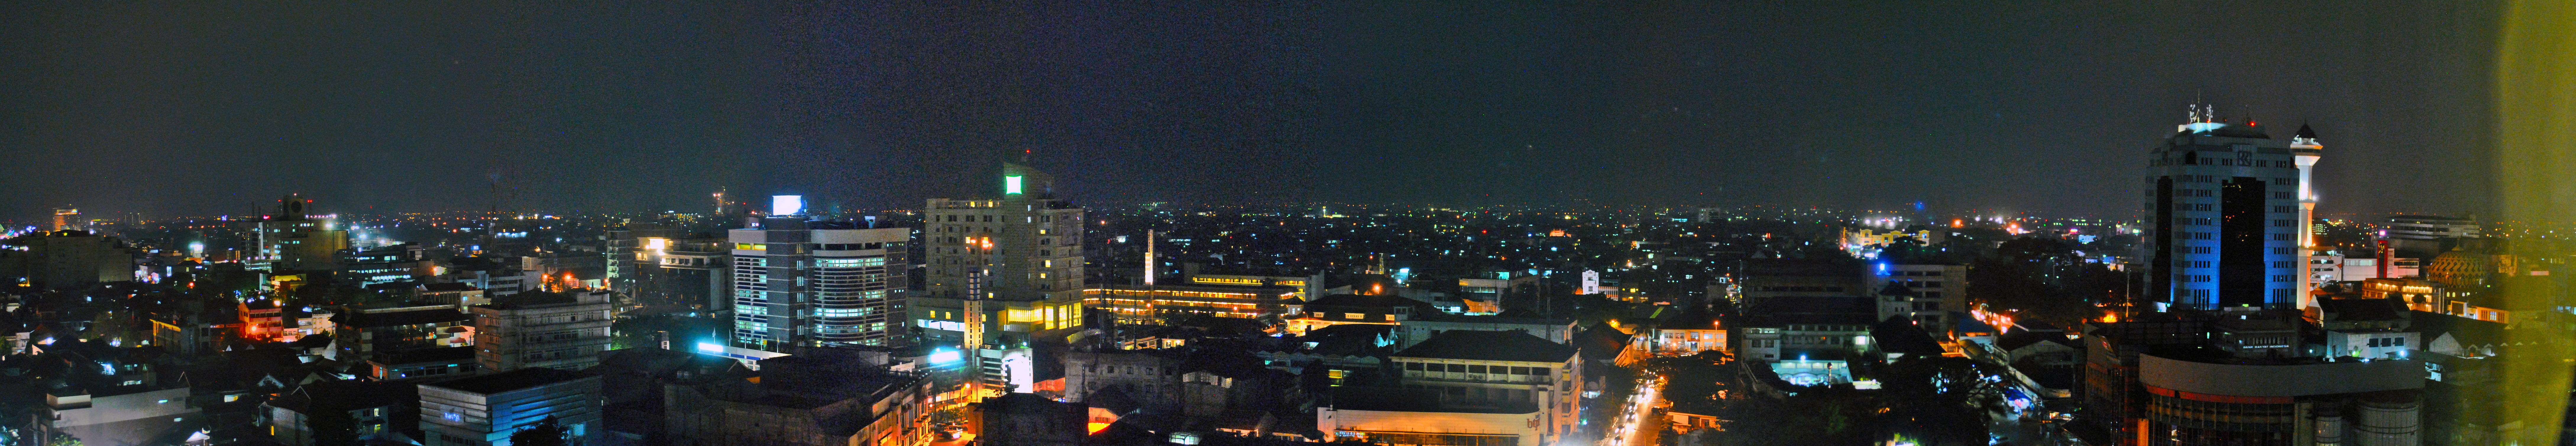 Bandung Wikipedia Night View City Center Taman Lembang Kota Administrasi